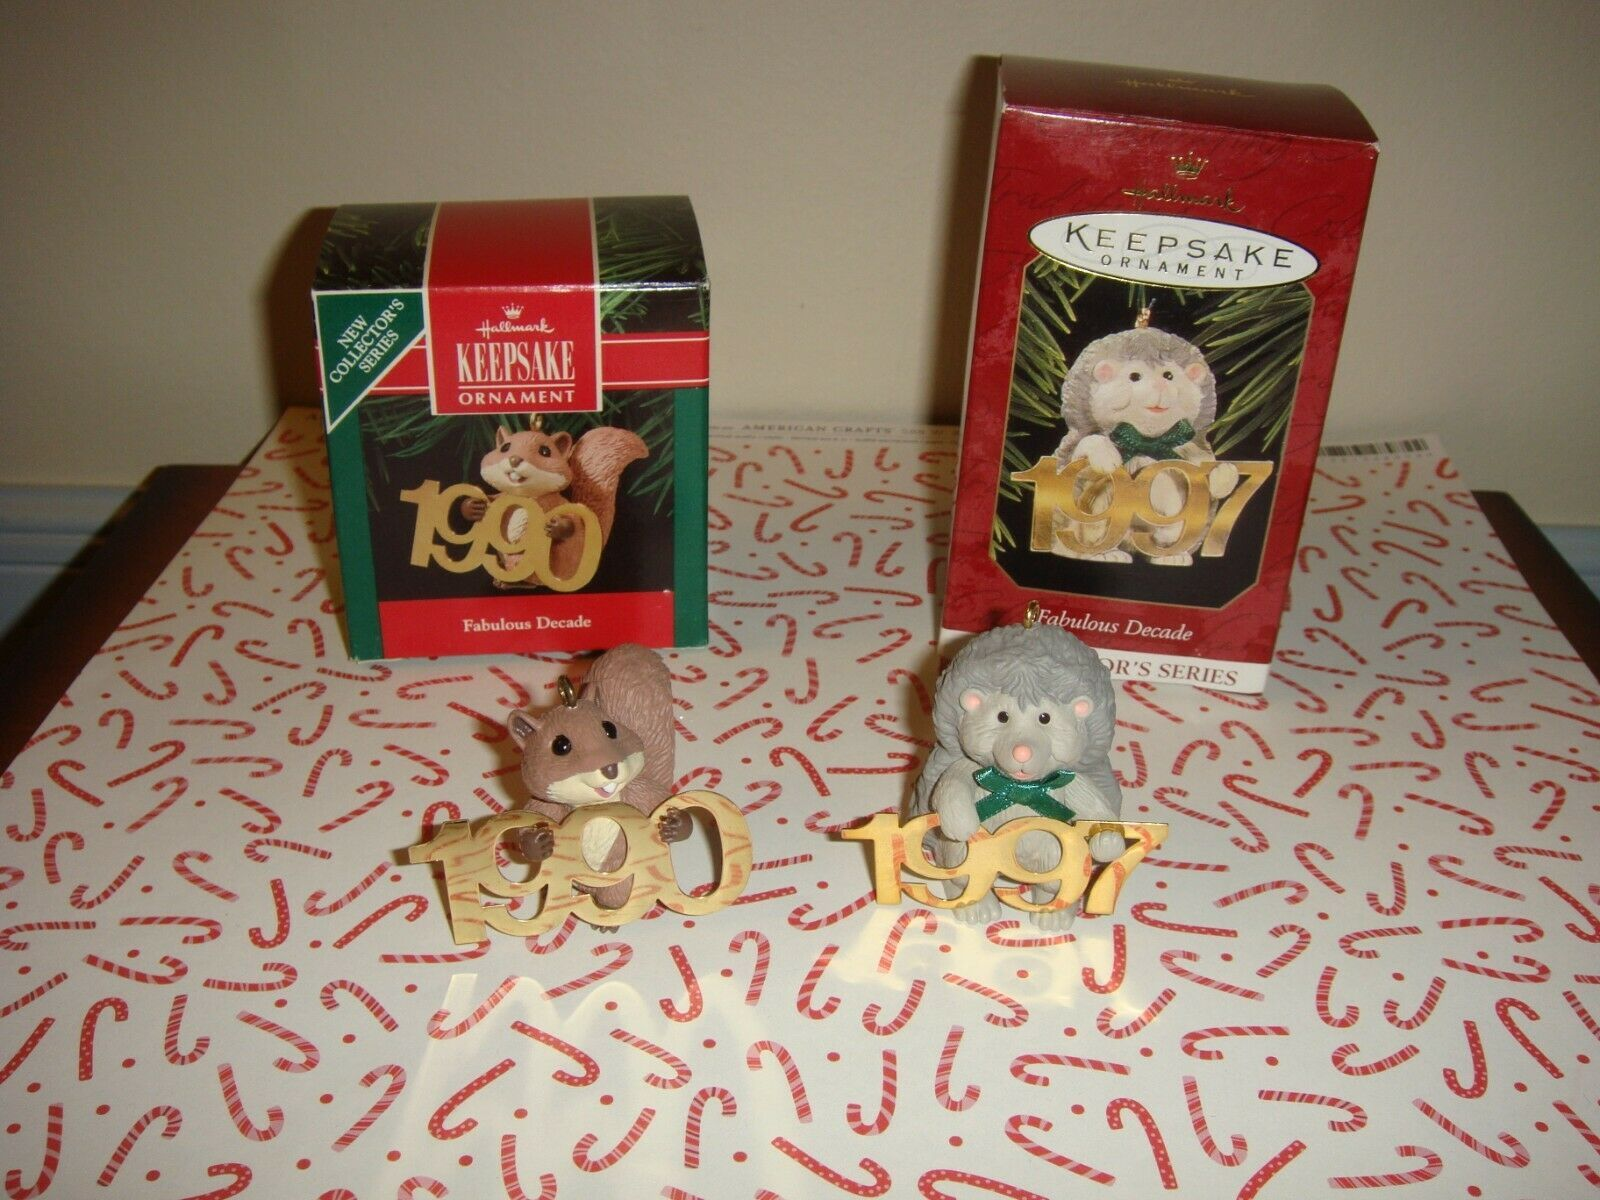 Hallmark 1990 & 1997 Fabulous Decade Series 1 & 8 Ornaments